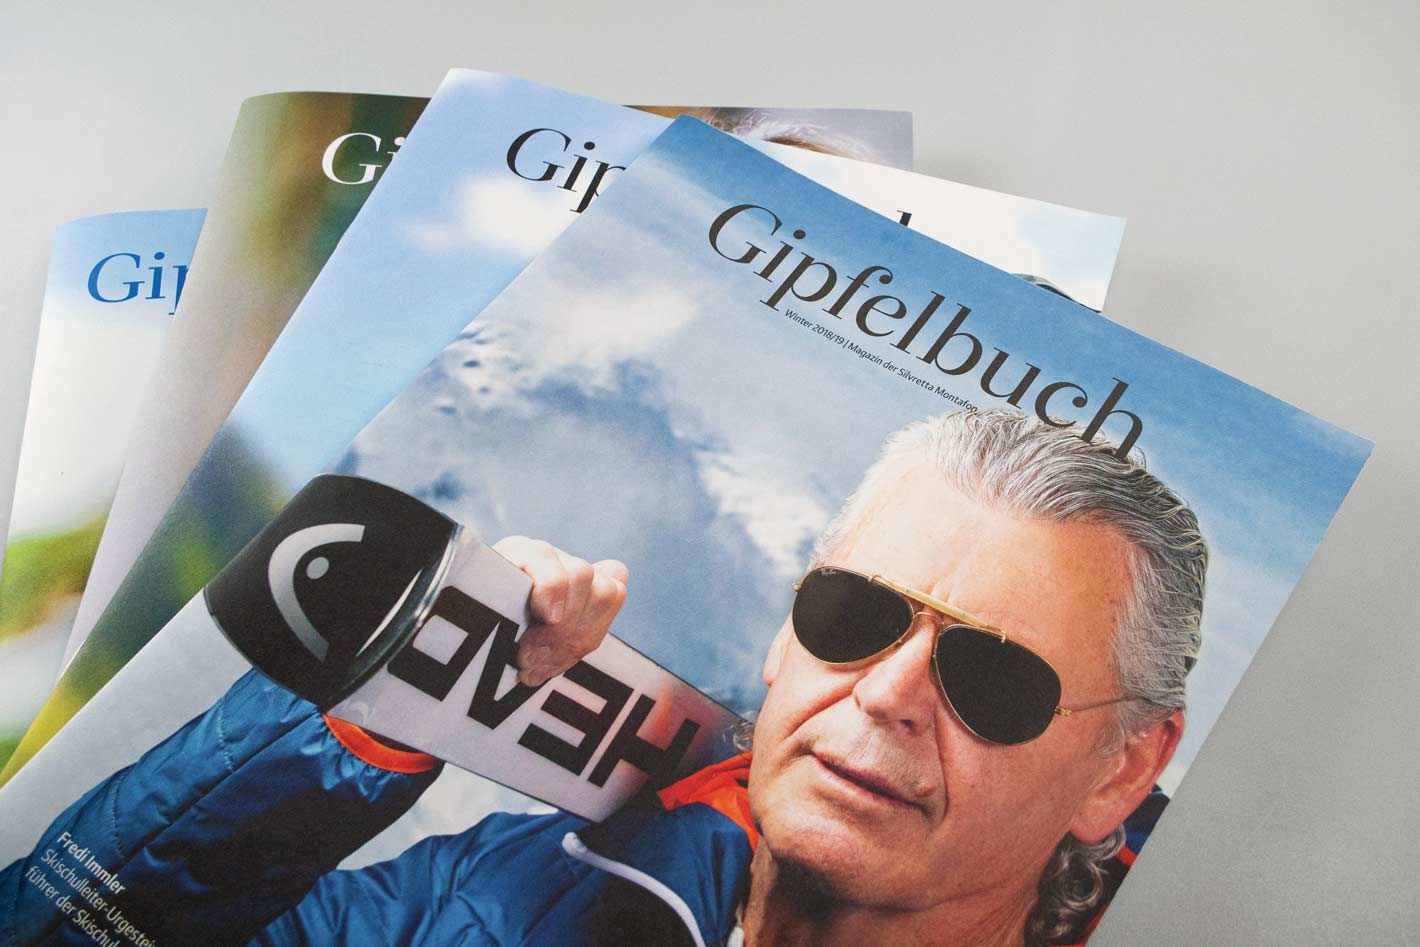 Gipfelbuch Cover